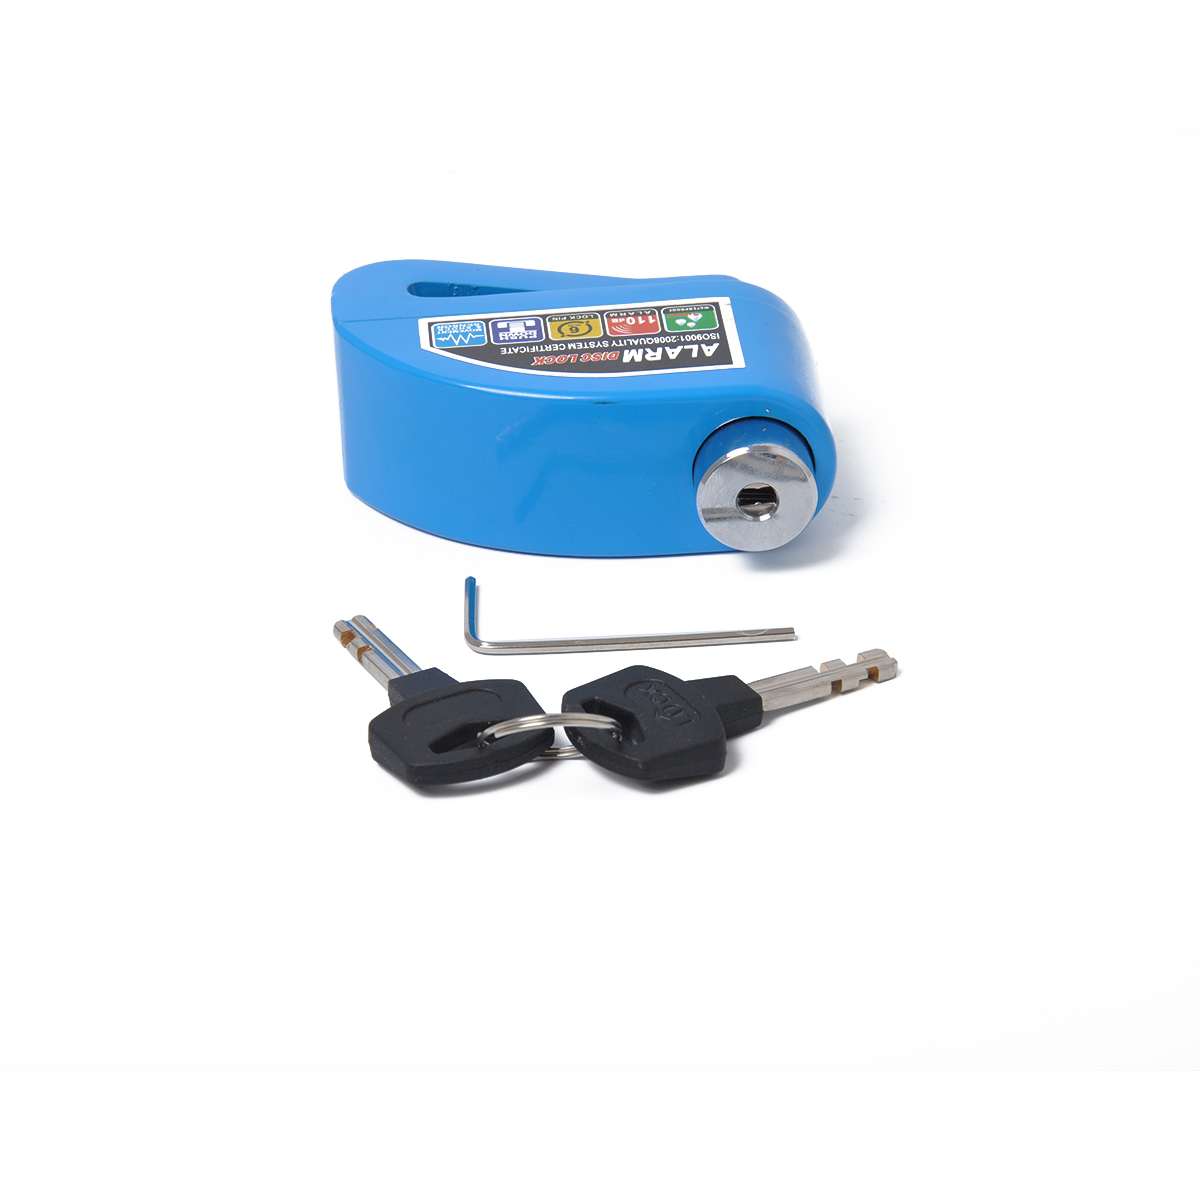 Waterproof Motorcycle Lock Bike Lock Security Anti-theft Lock Moto Disc Brake Lock Kit Blue-aluminum alloy disc brake lock